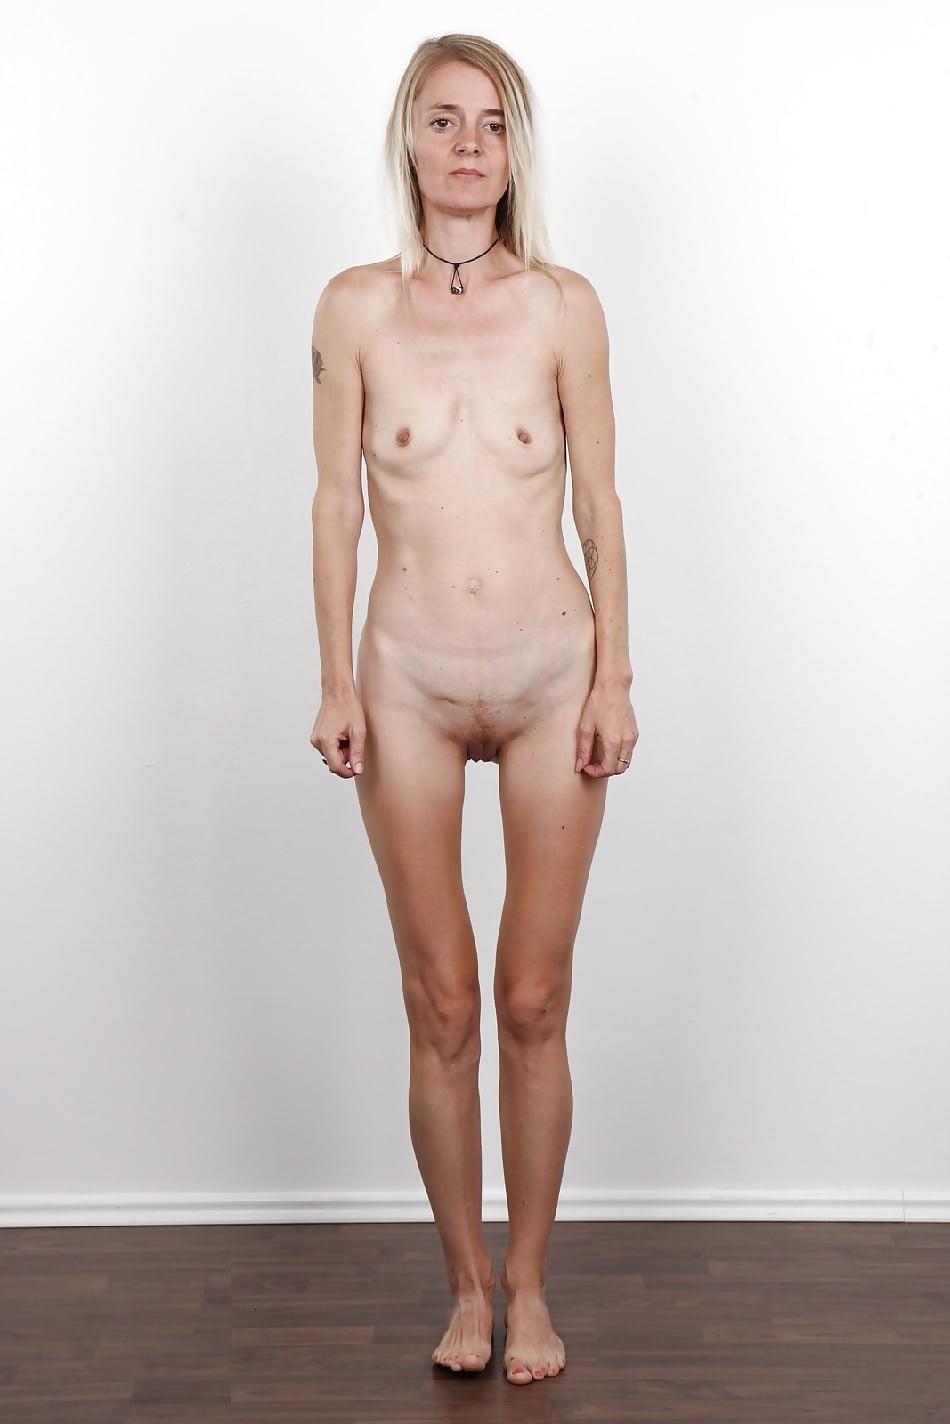 Super skinny women standing porn pics — 12